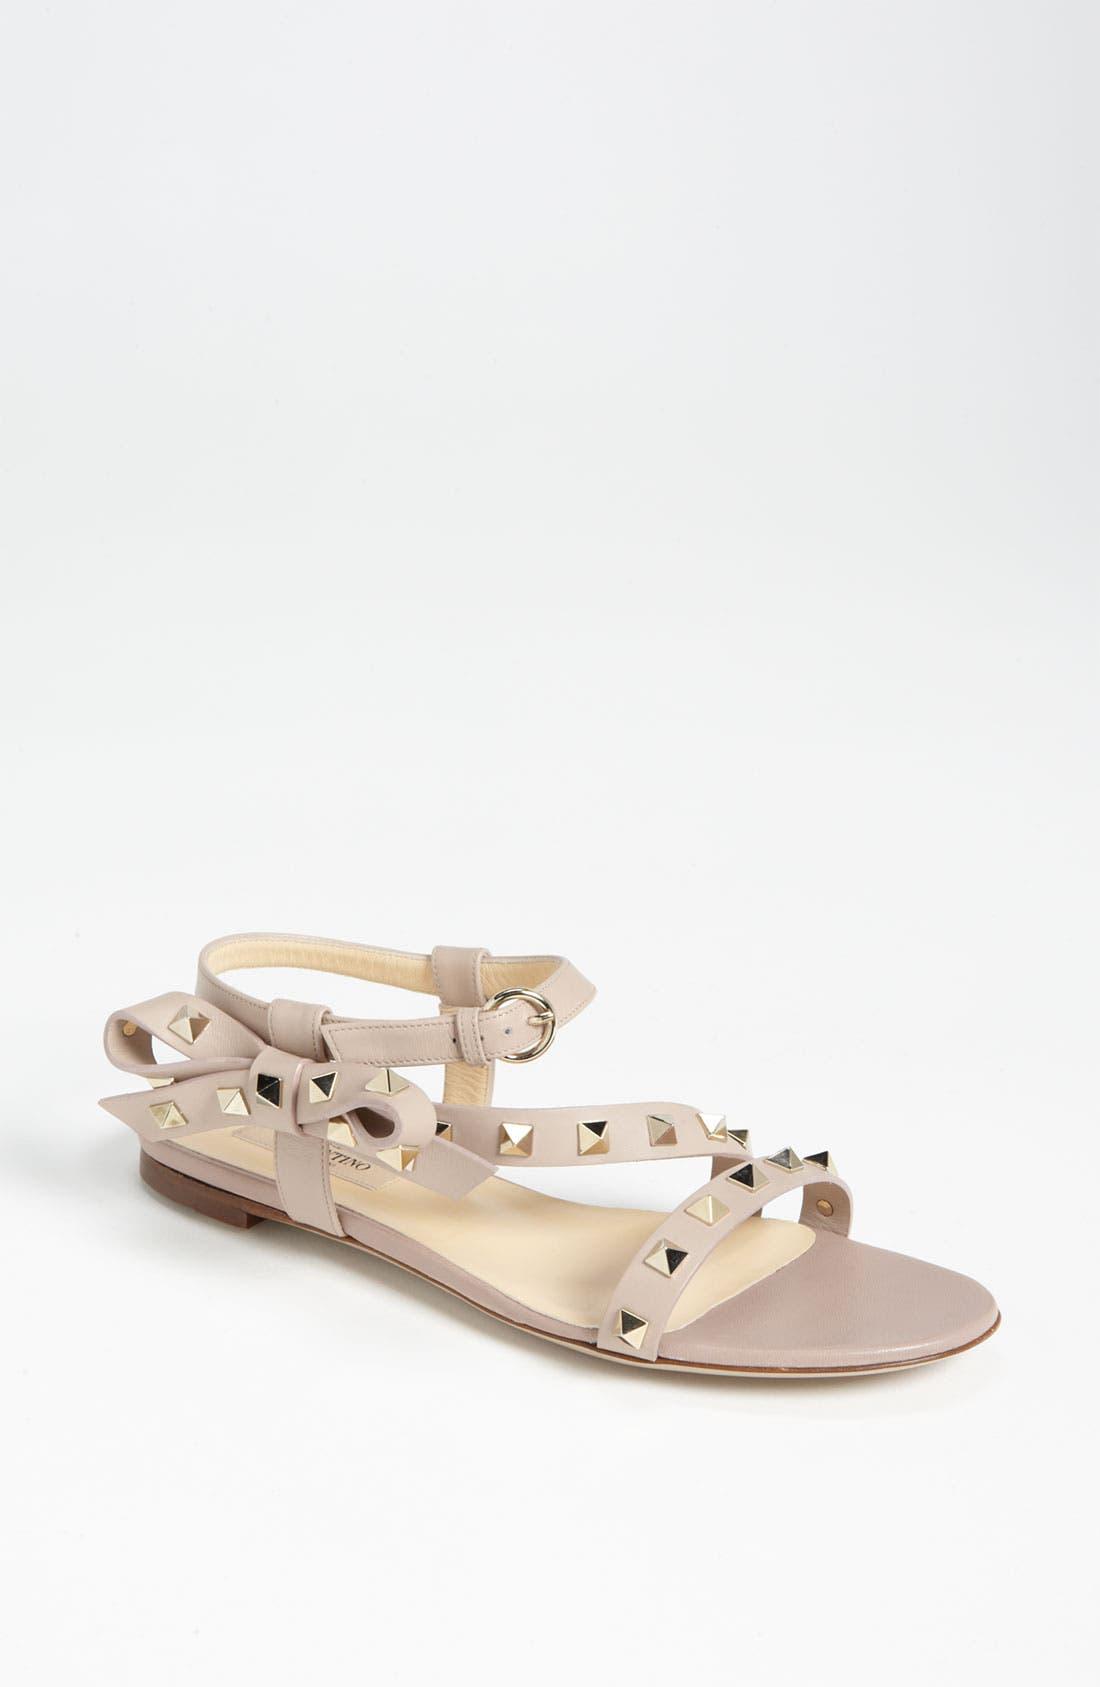 Main Image - Valentino 'Rockstud' Bow Flat Sandal